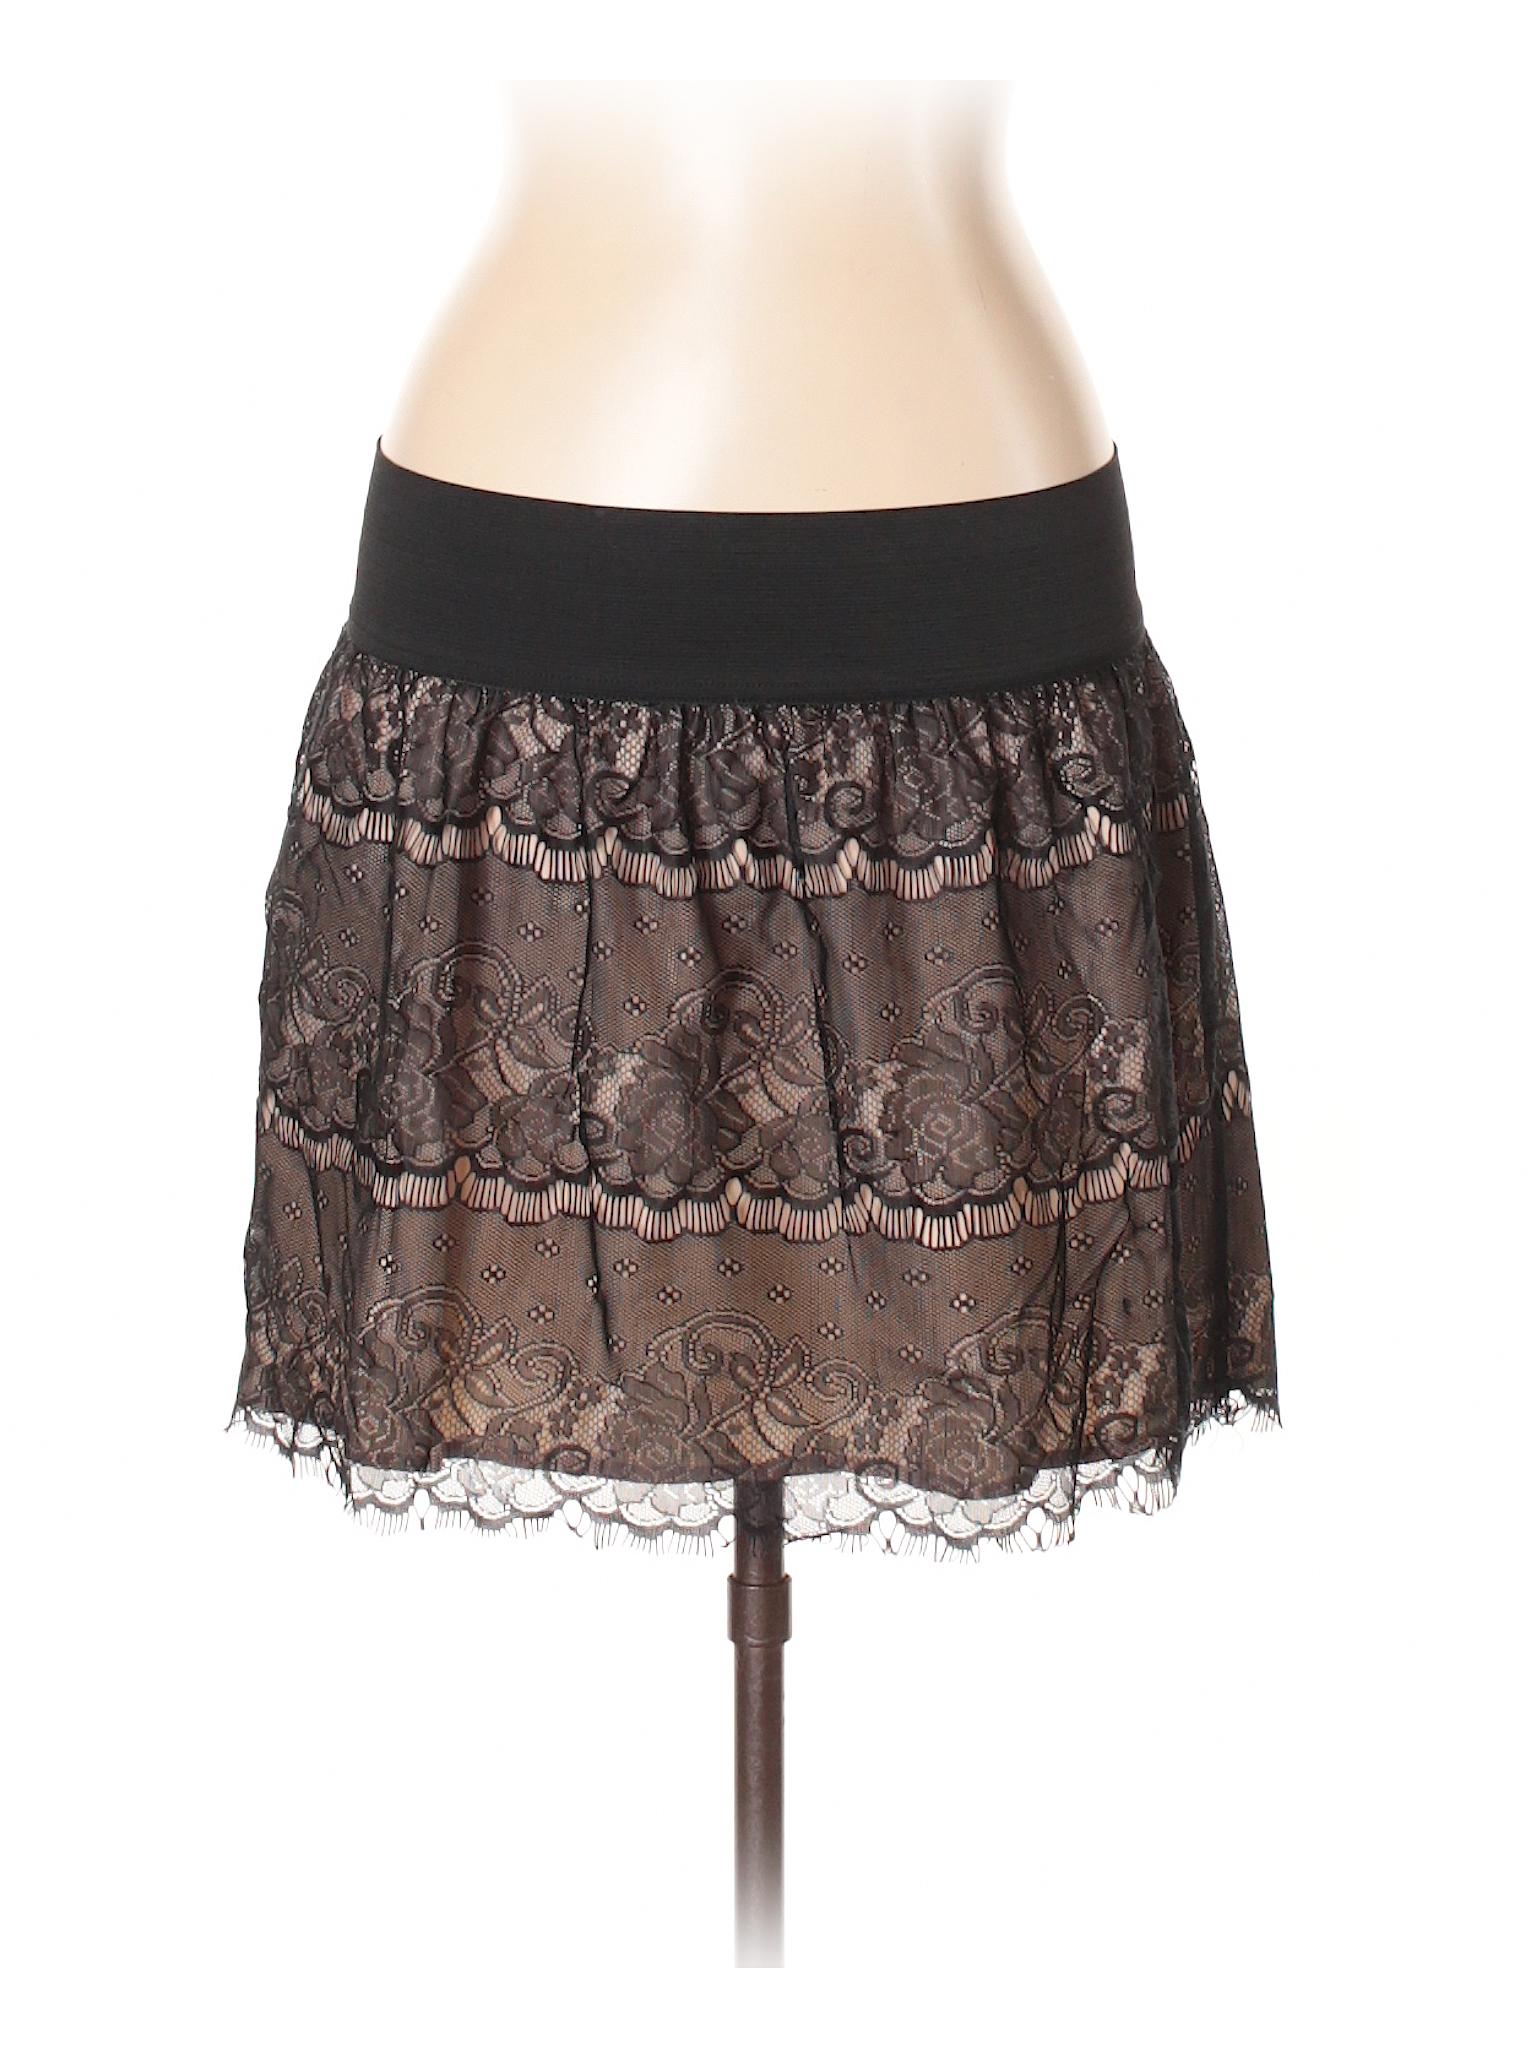 Boutique Boutique Casual Skirt Xhilaration Xhilaration wf8wOP